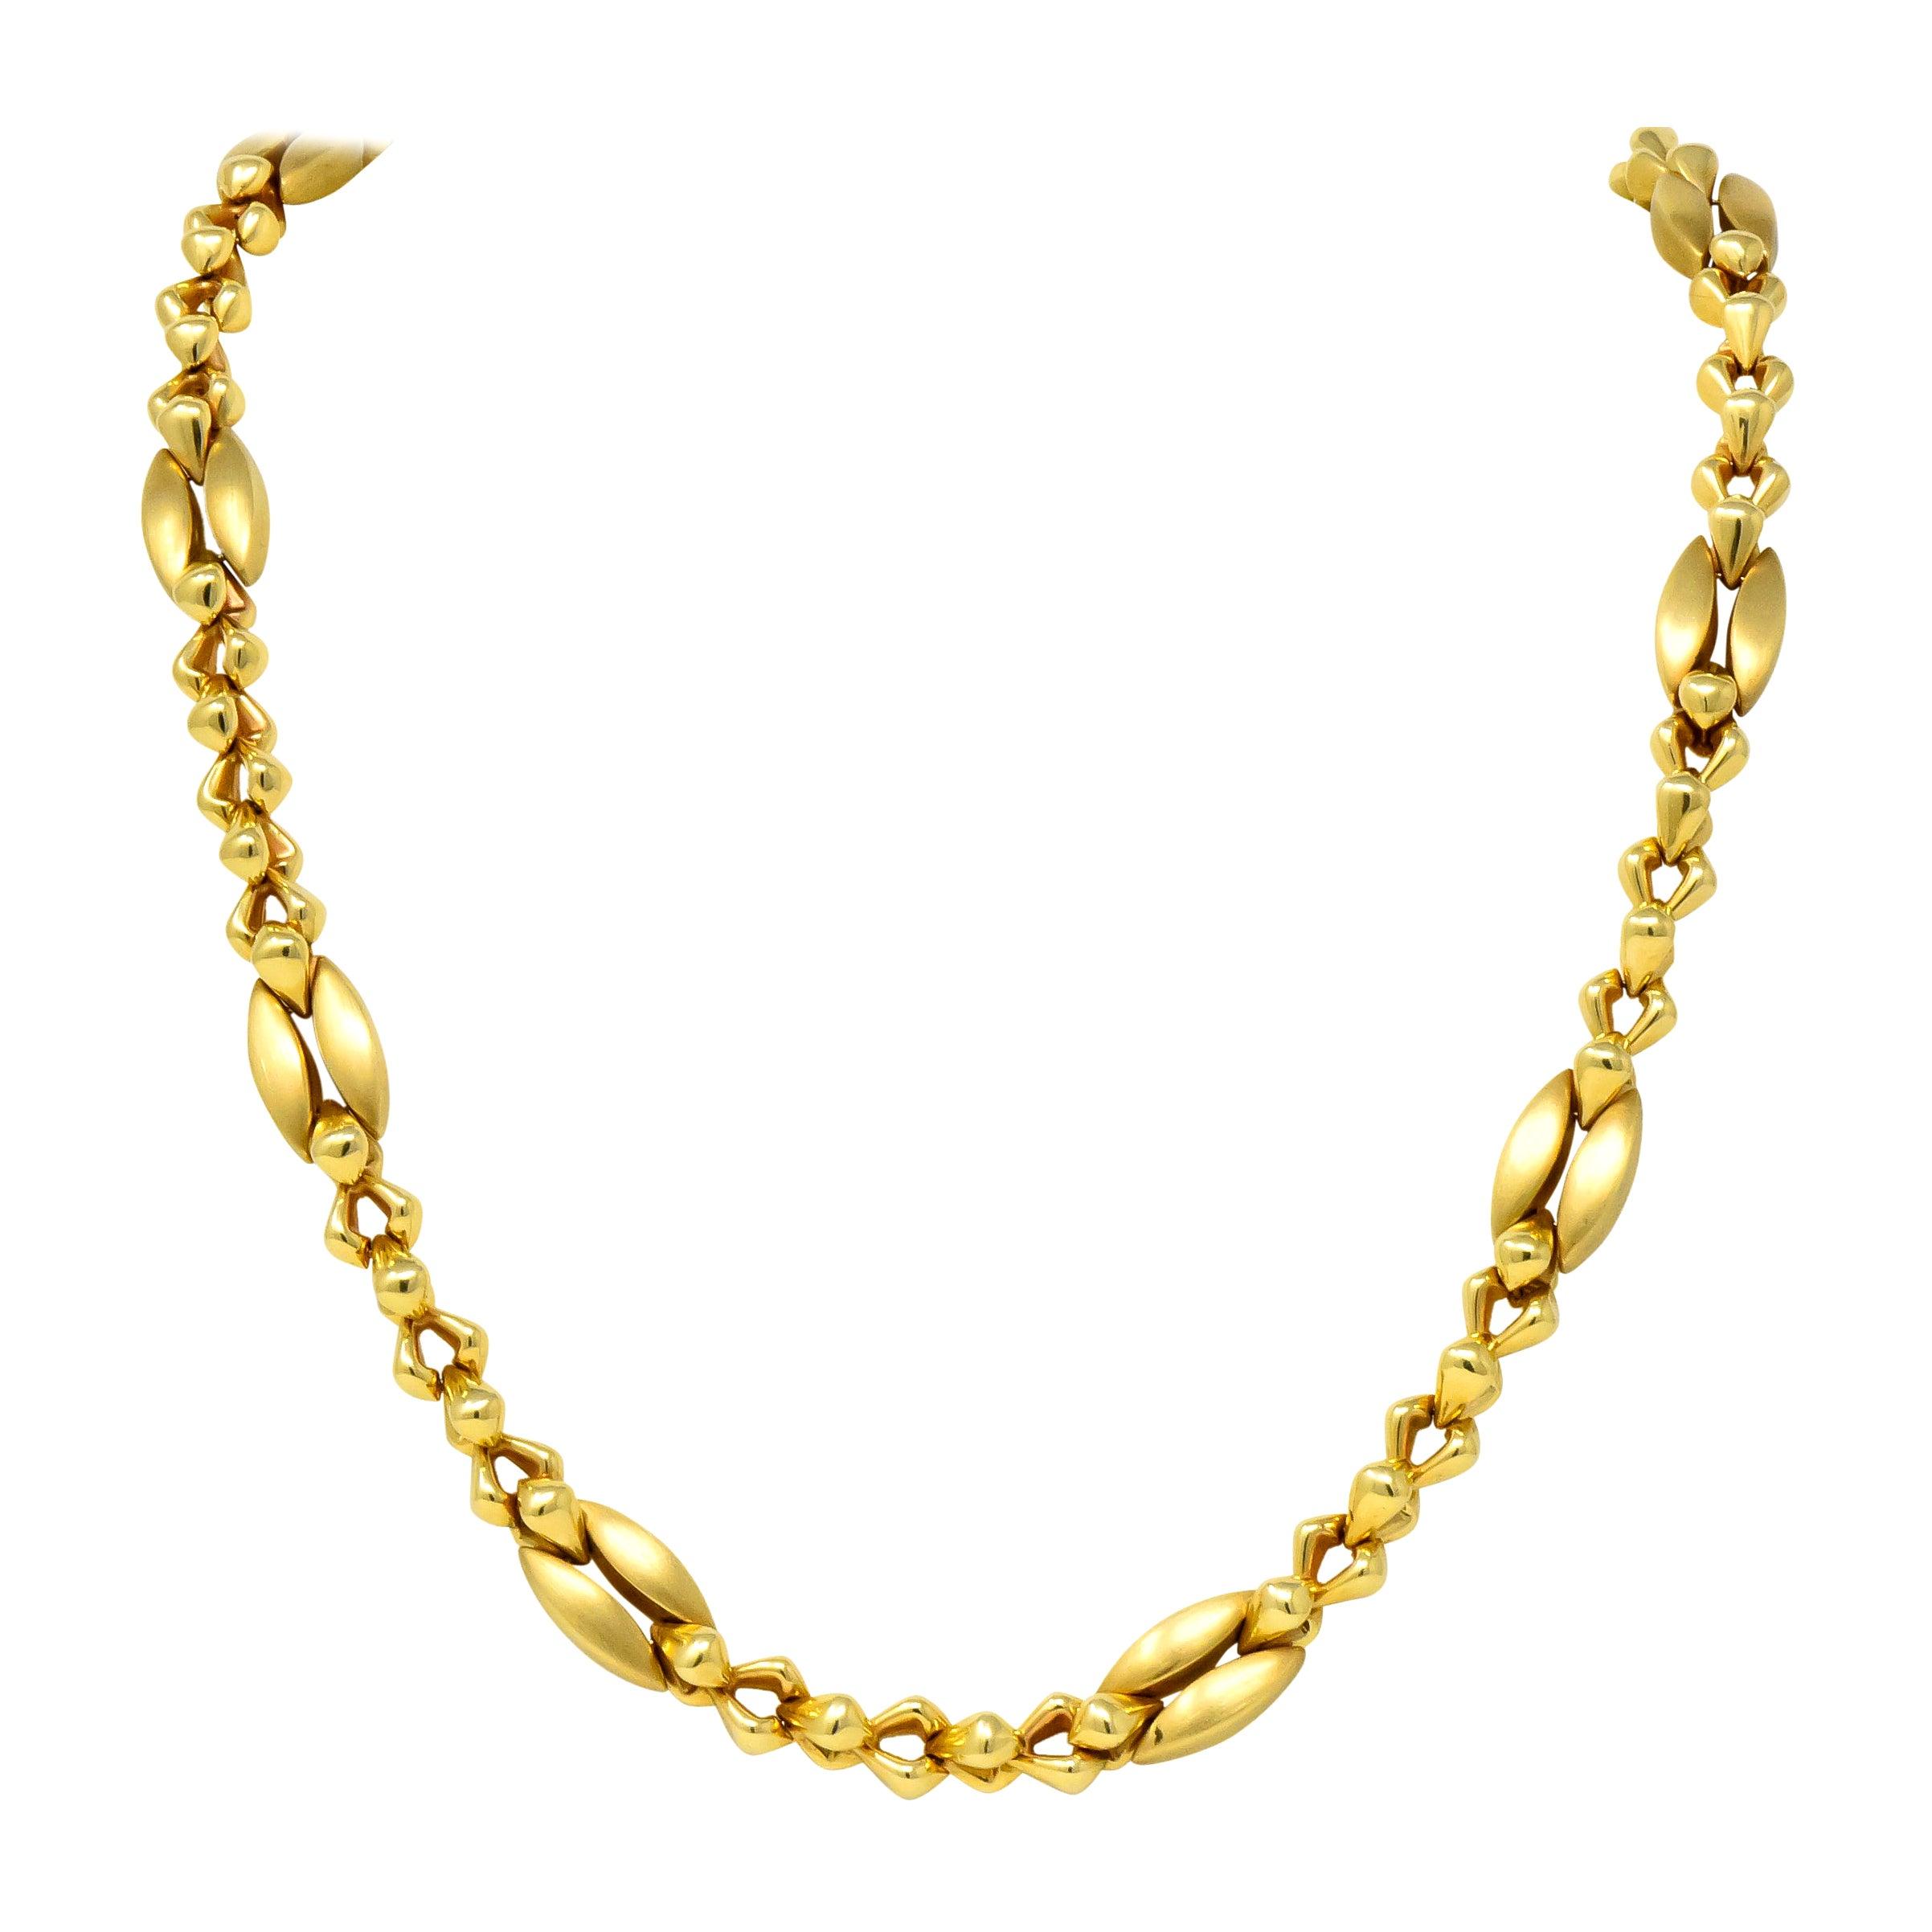 Tiffany & Co. 14 Karat Gold Bold Long Link Necklace, circa 1980